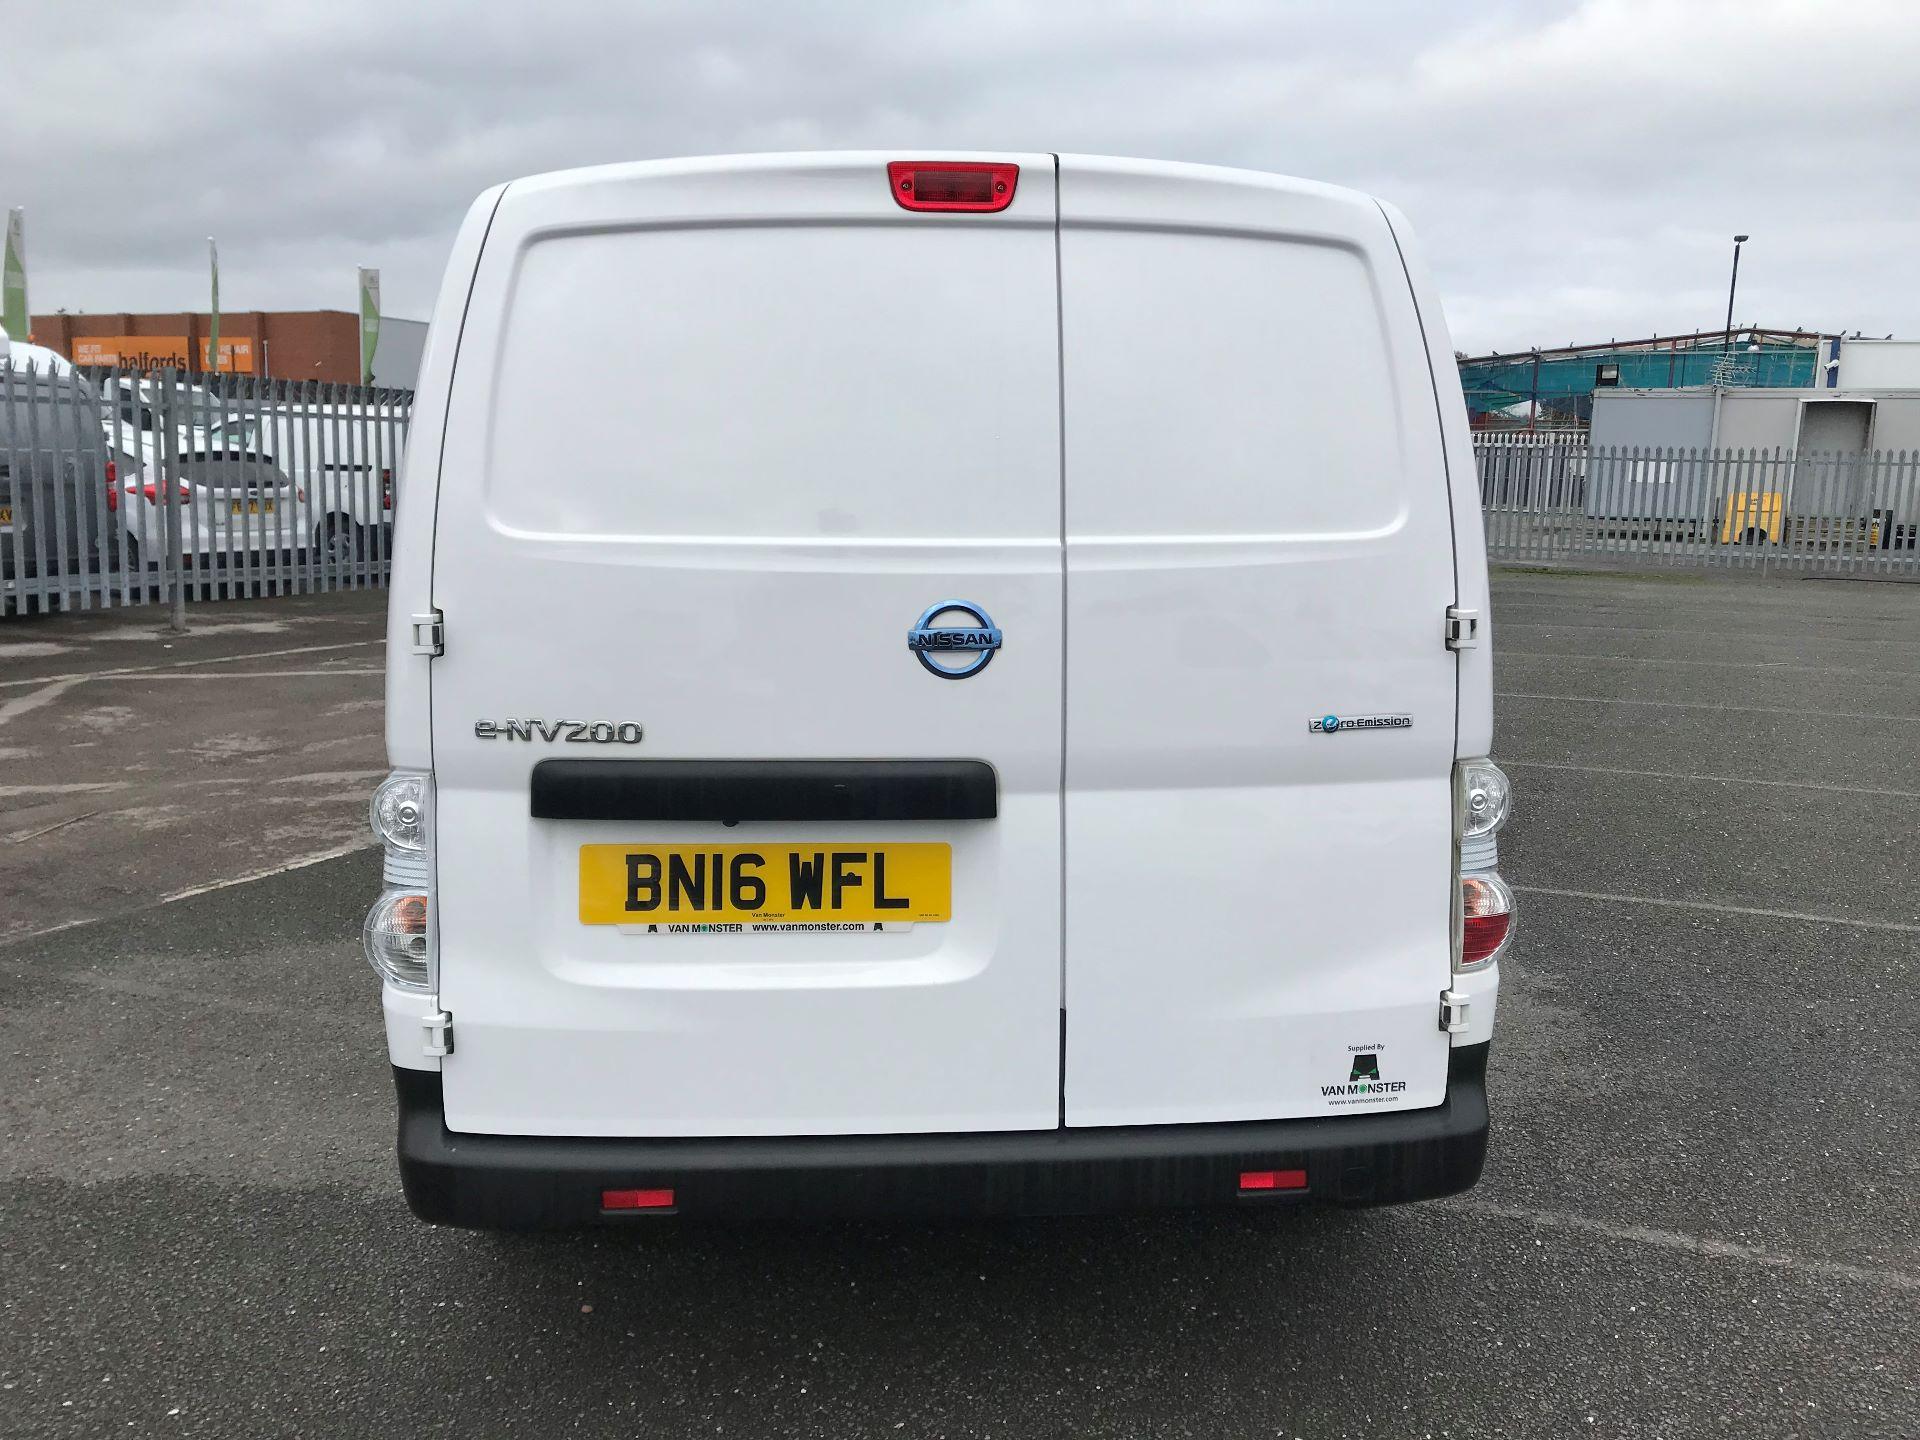 2016 Nissan E-Nv200 Acenta Rapid Plus Van Auto Euro 6 (BN16WFL) Image 6